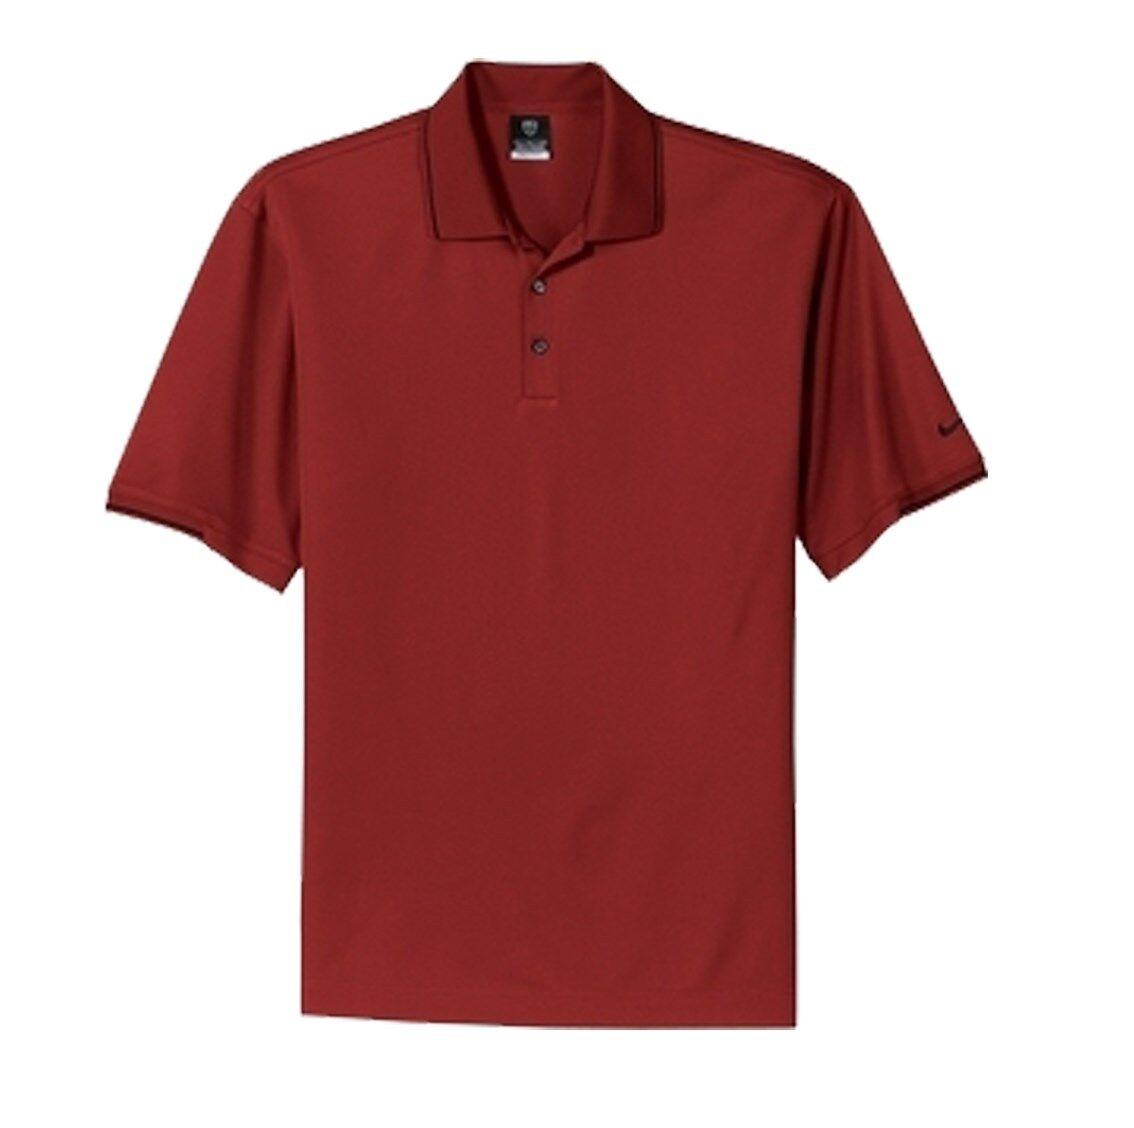 fad6dce1 NIKE GOLF Mens Size S L XL 3XL 4XL Dri-Fit Polo Sport Shirts with Tipped  Trip